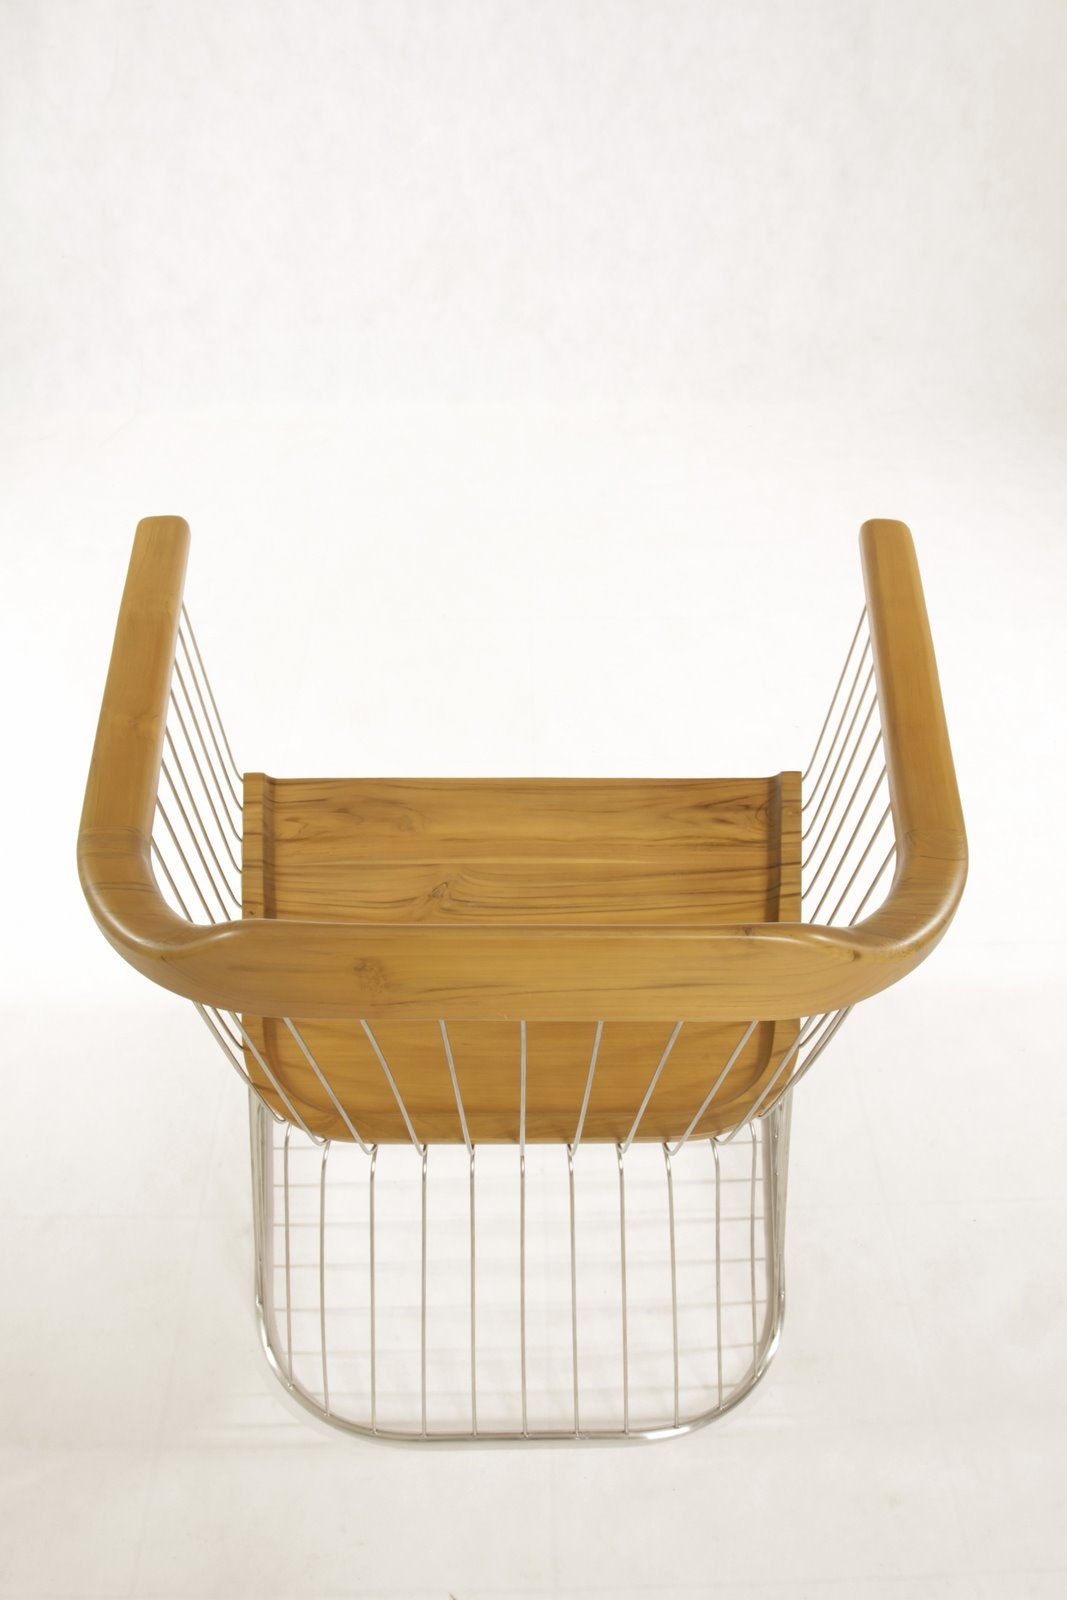 011210 interval chair_10.jpg